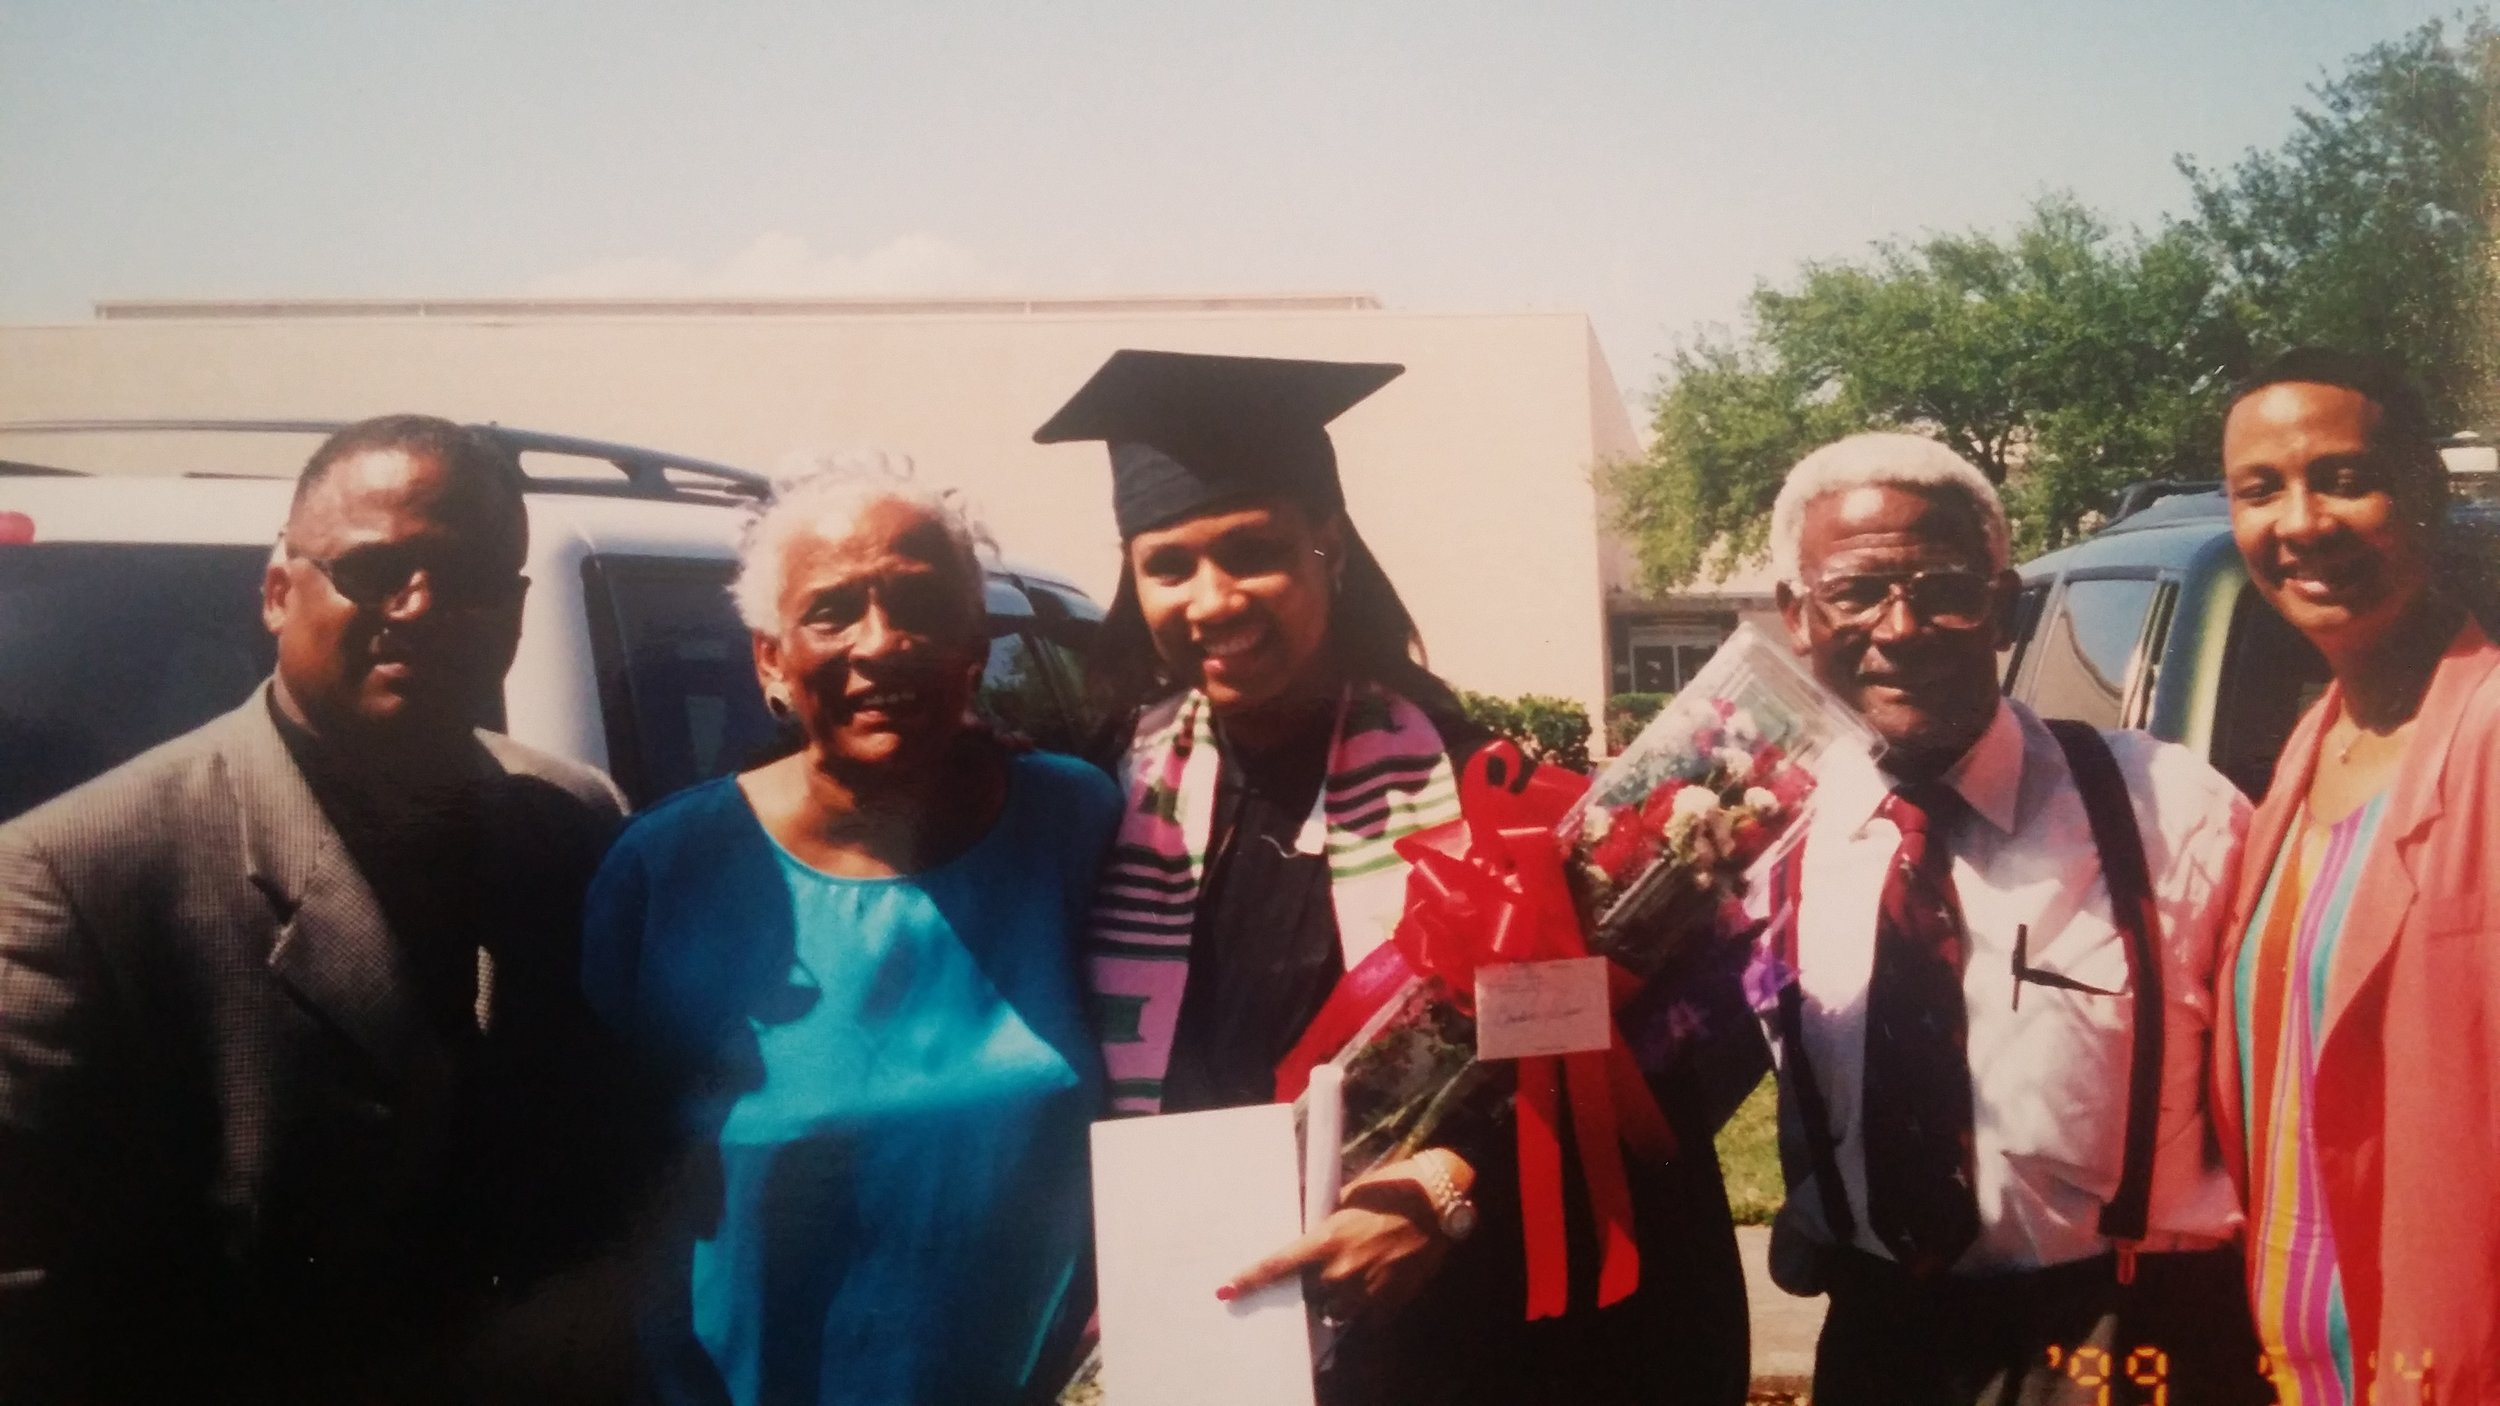 Dad, Grandmommy, Grandaddy and Mom at my college graduation.